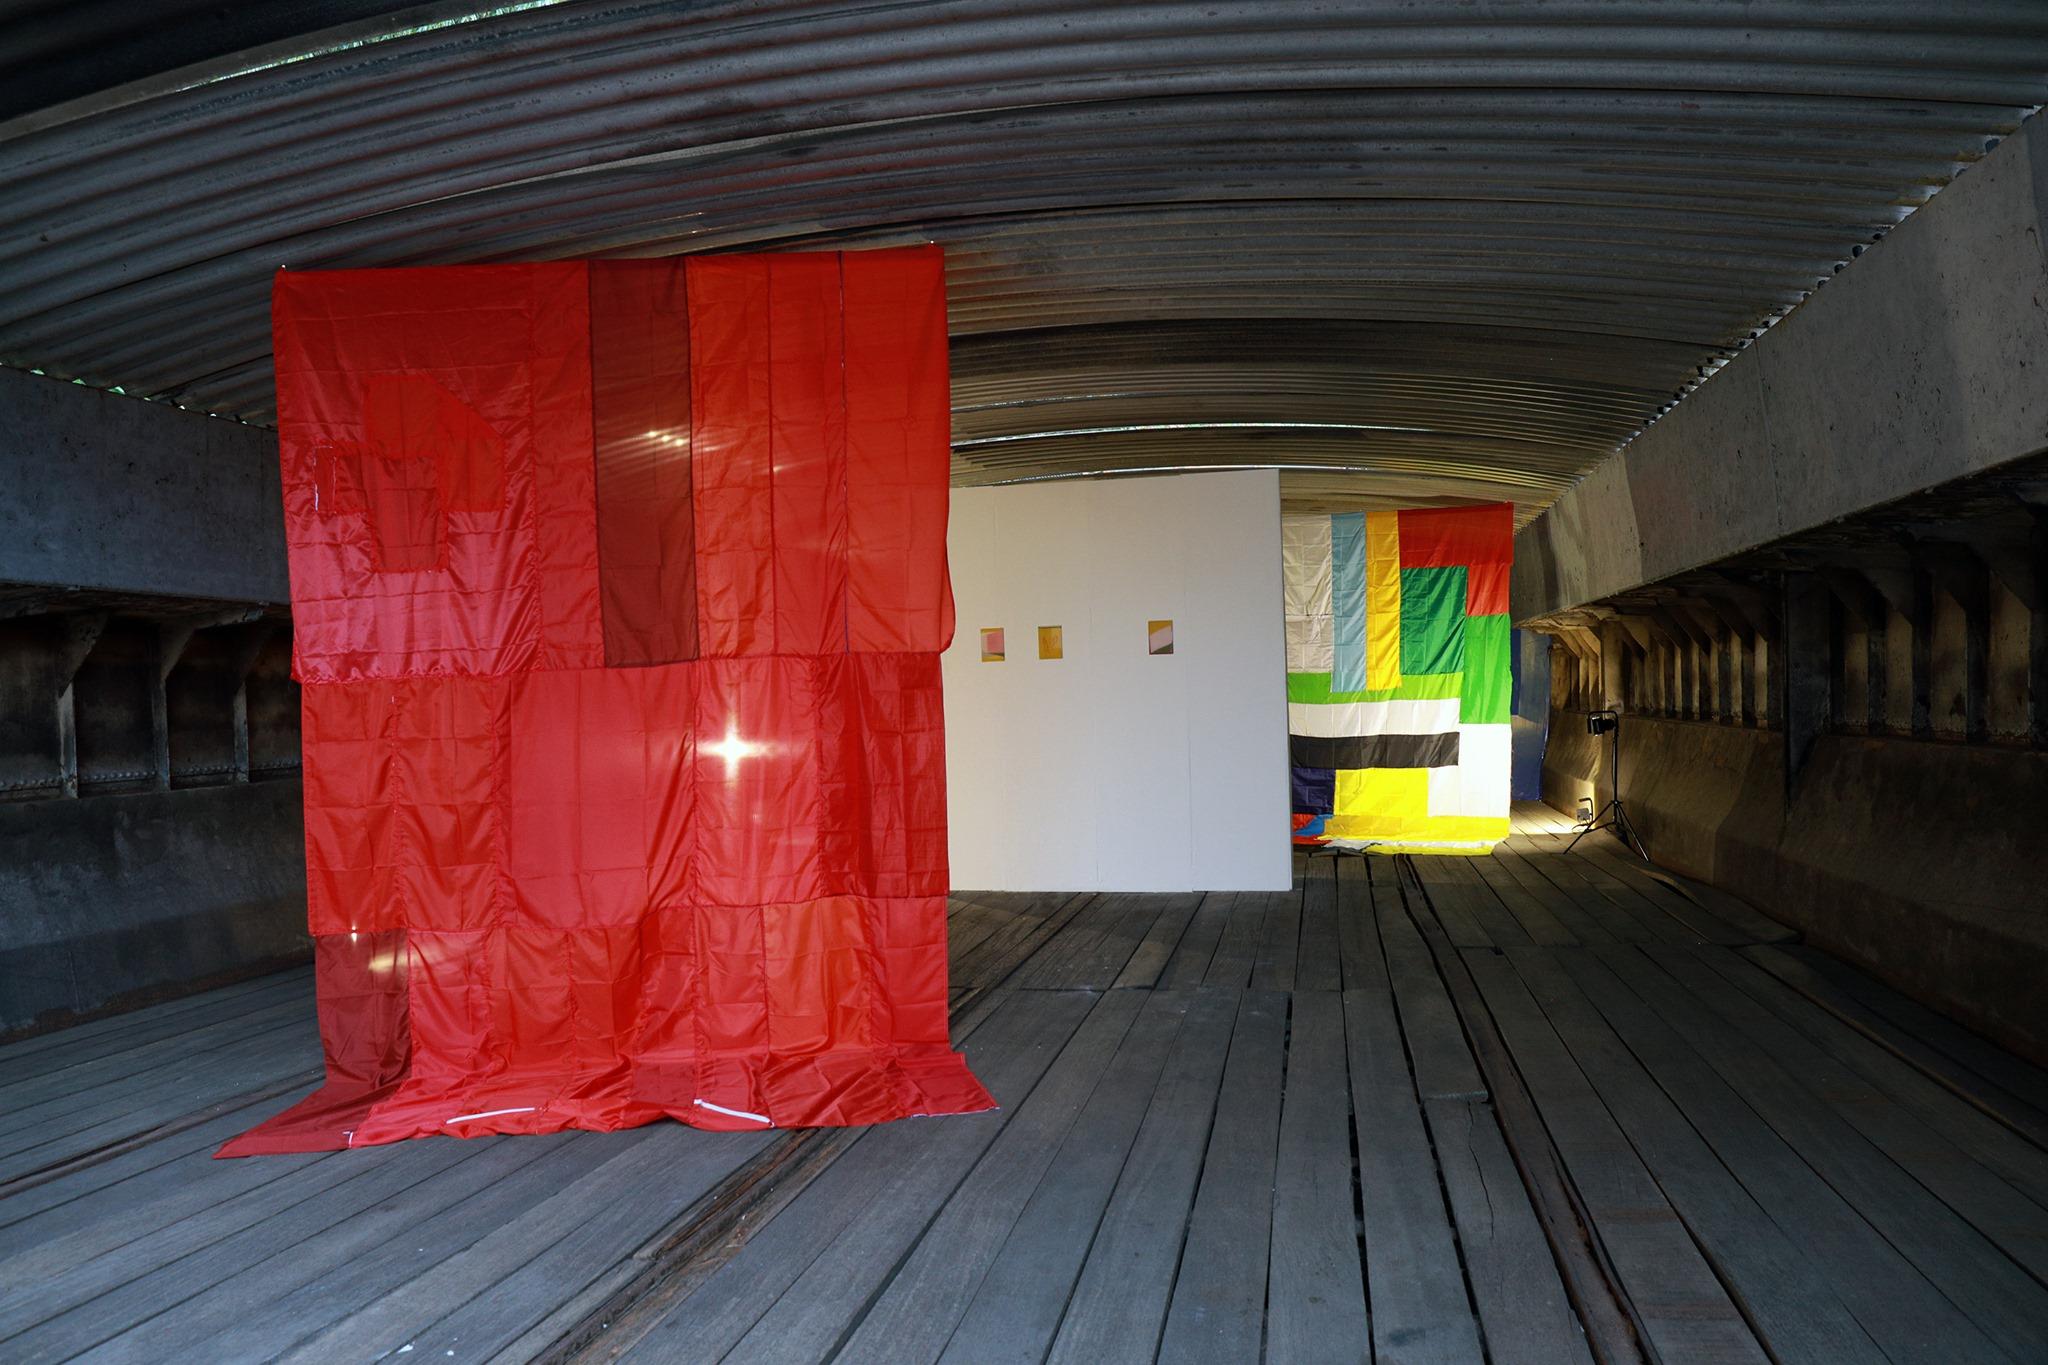 Sichtfeld, 2019